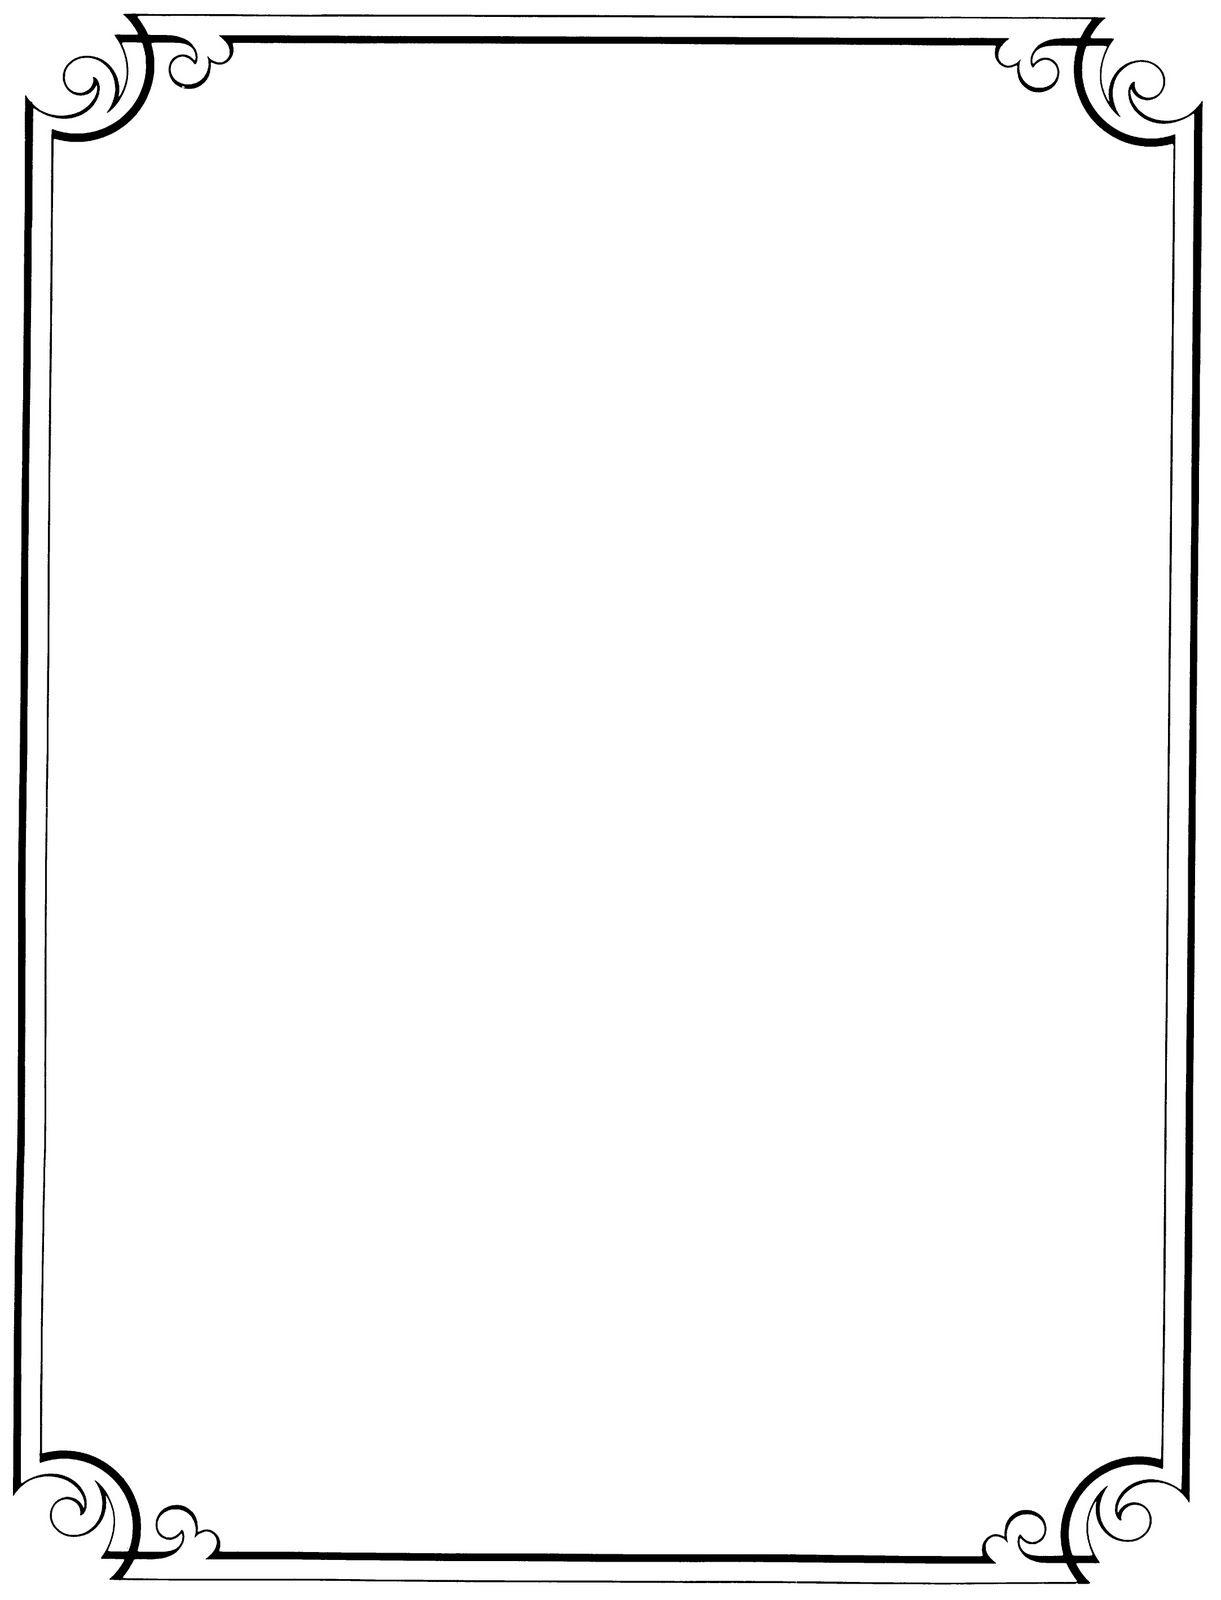 Free Printable Clip Art Borders    : Free Vintage Clip Art - Free Printable Clip Art Borders